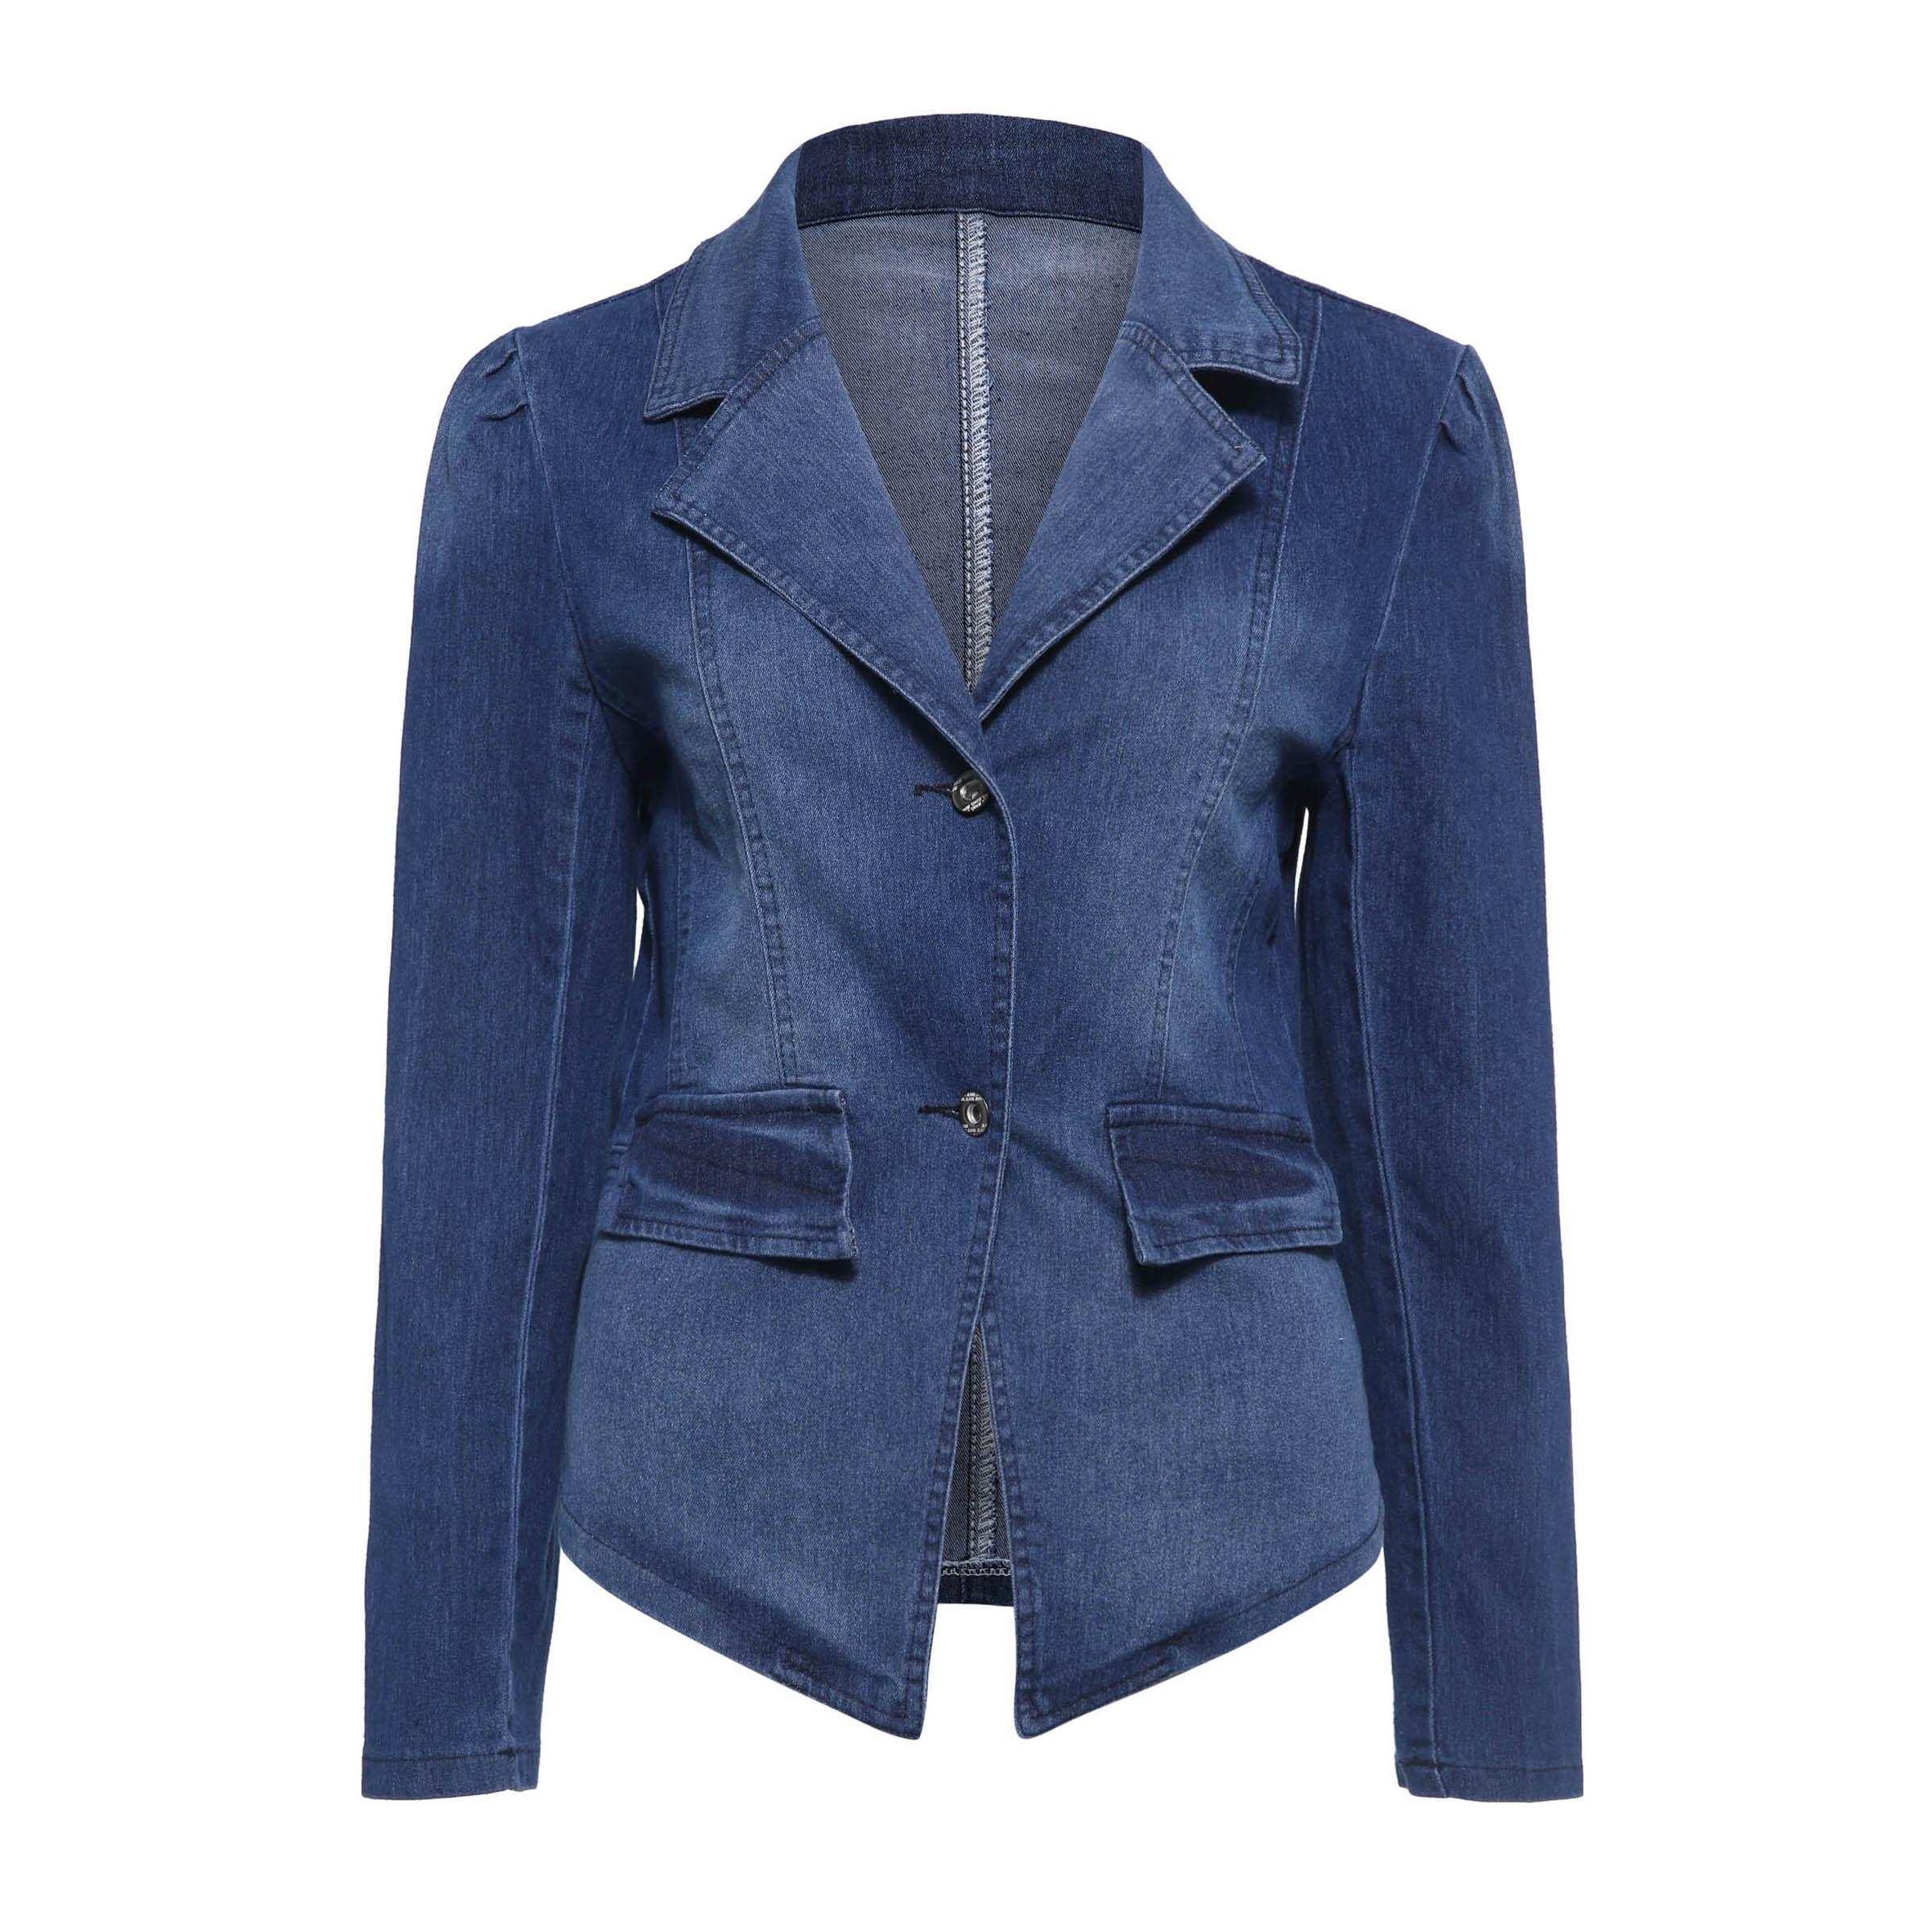 Jaqueta de lapela fina denim feminino 2019 moda casual feminino senhoras jaquetas topos street wear coats gótico punk outwears